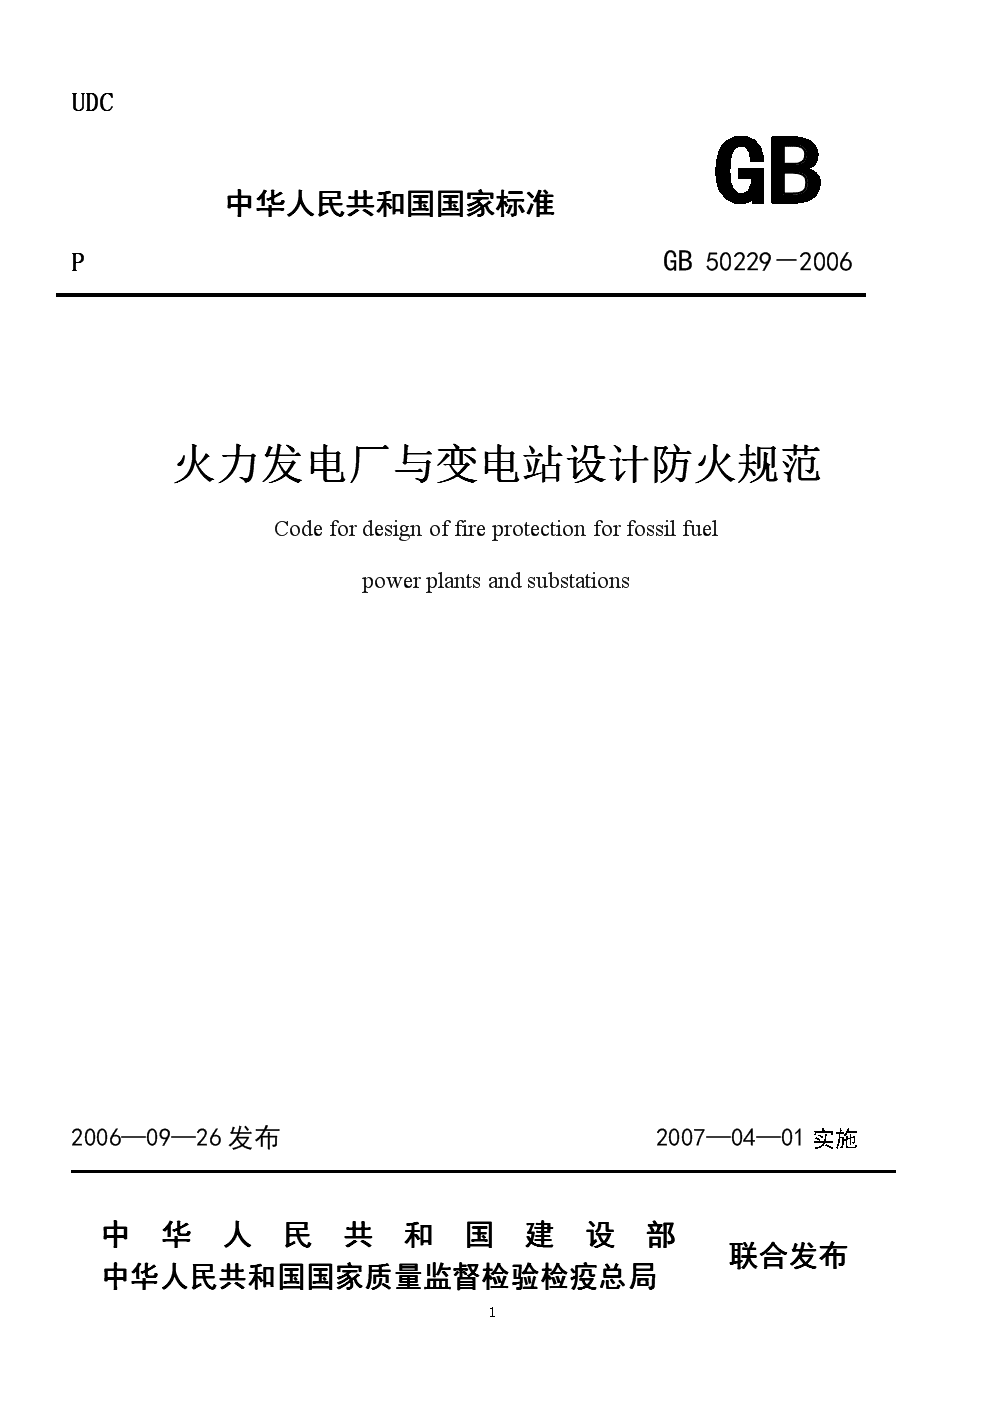 GB 50229-2006火力发电厂与变电所设计防火规范.docx